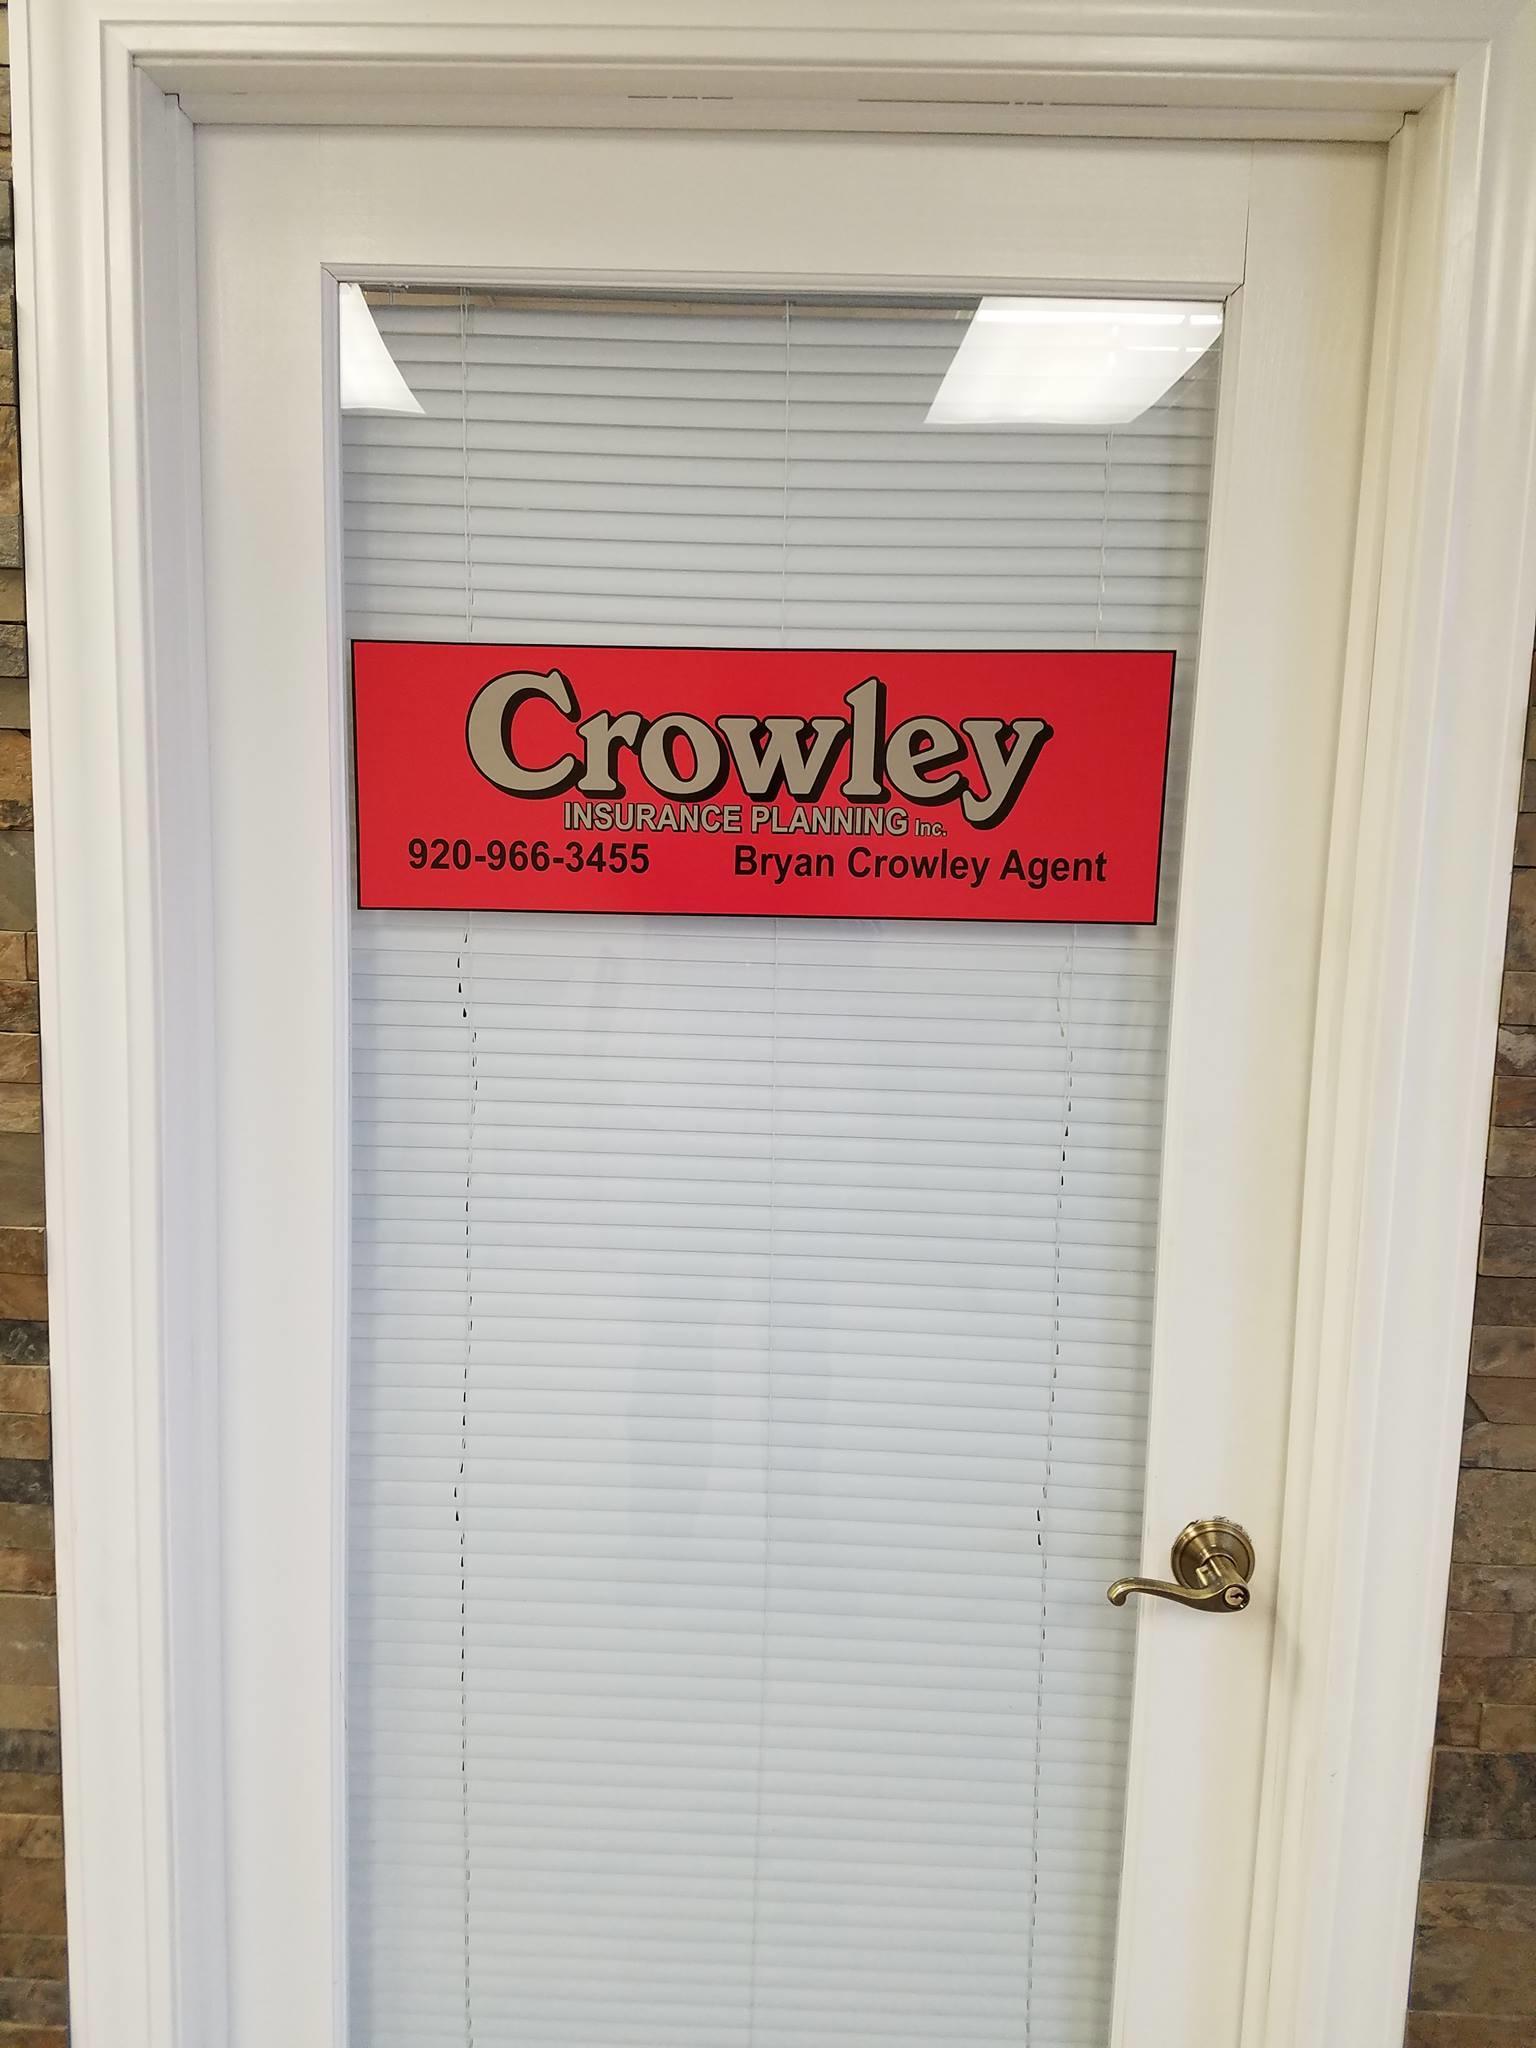 Crowley Insurance Planning Inc image 1